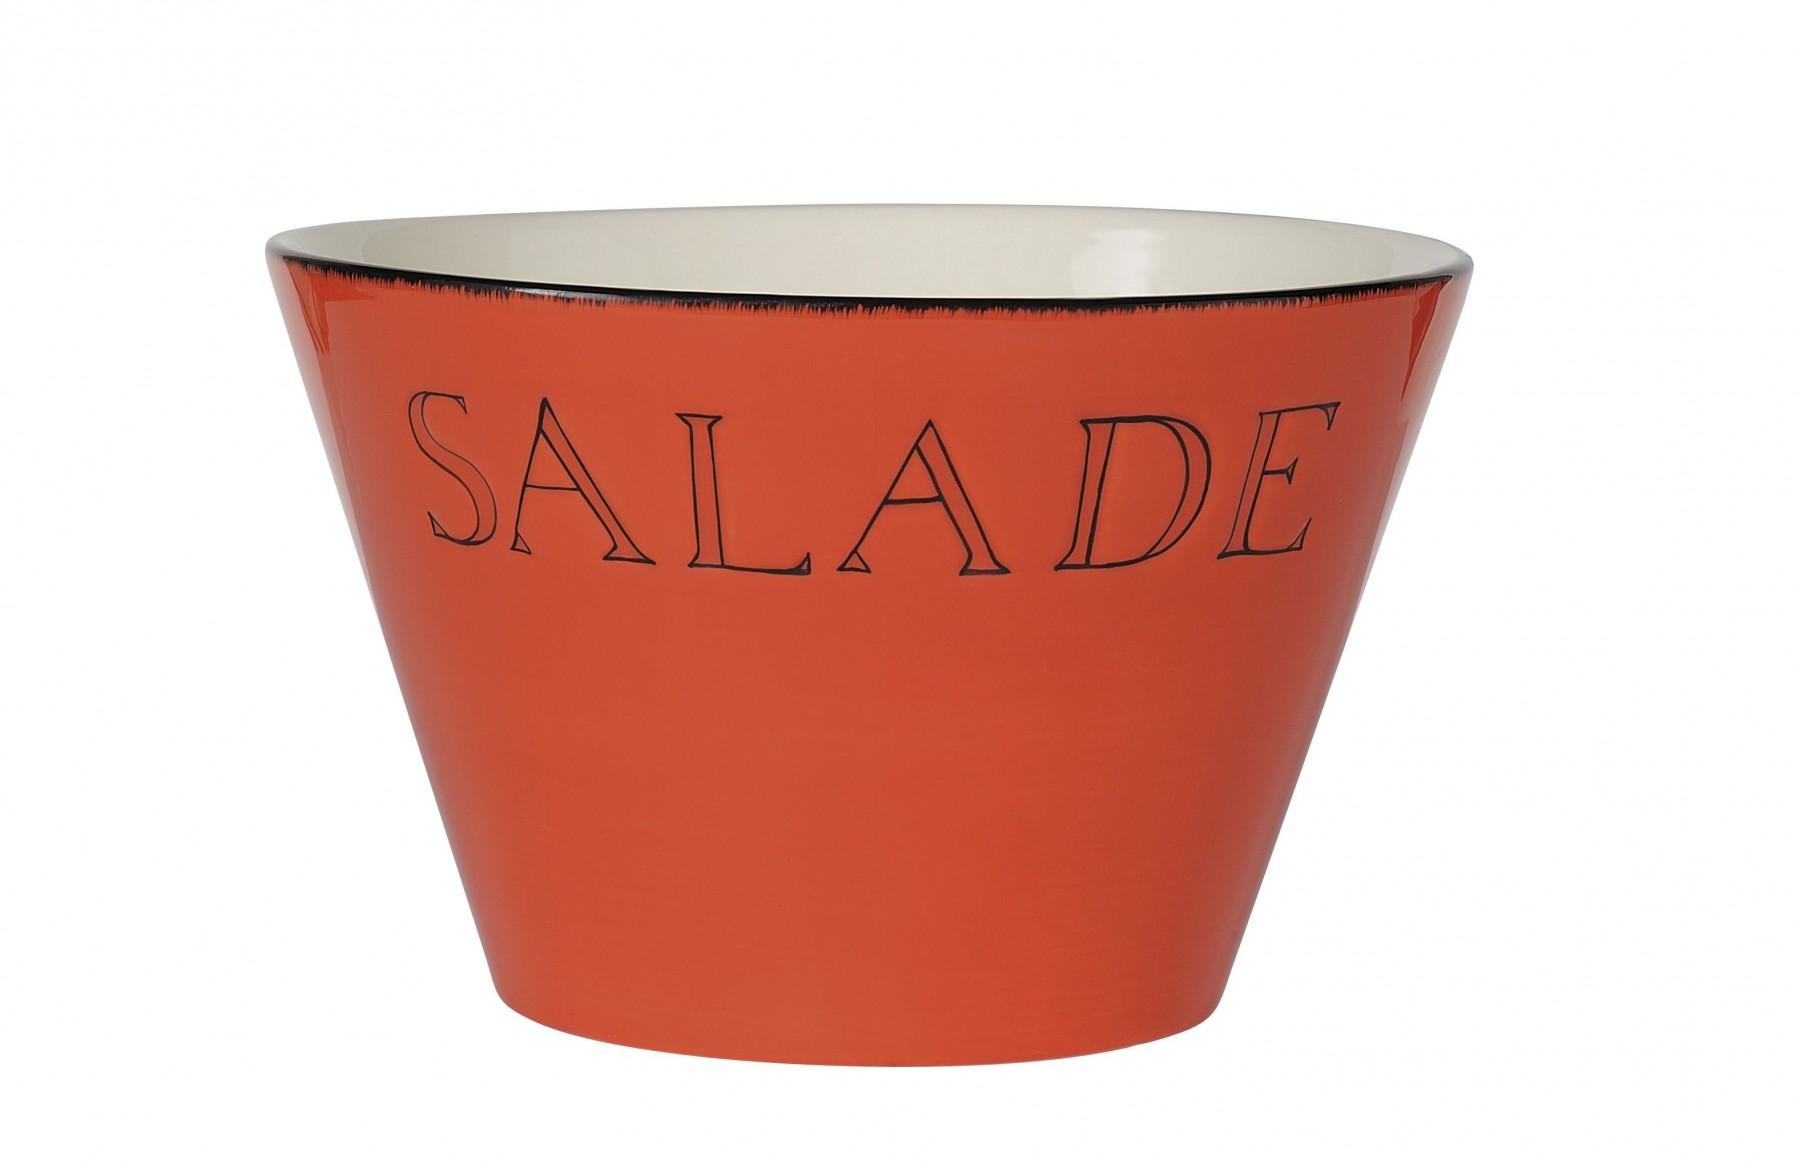 Salade  -  Saladier mandarine  en céramique 25XH15 Cm